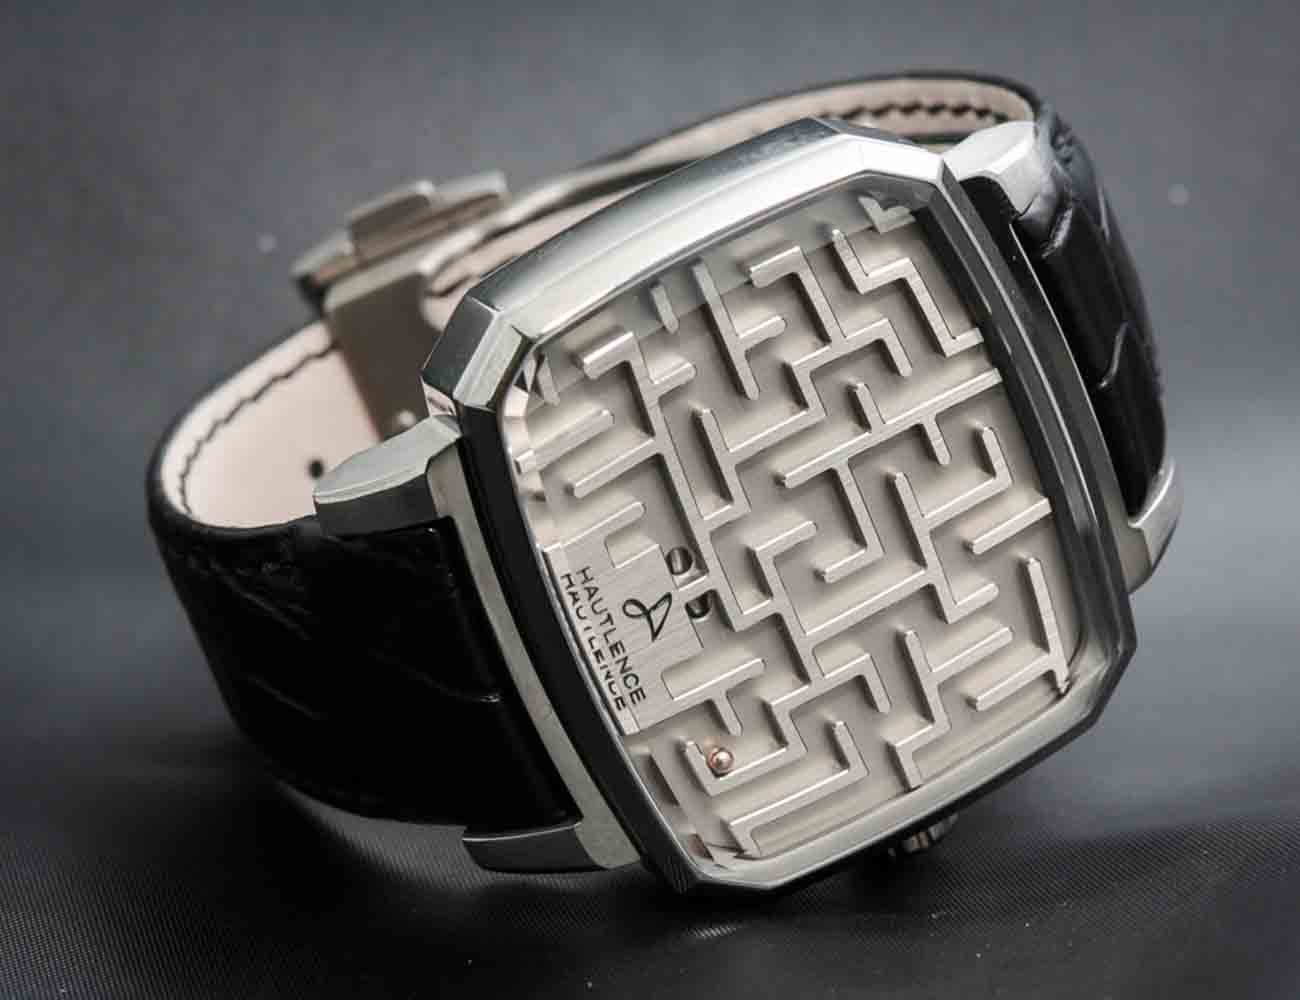 Labyrinth Maze Watch by Hautlence